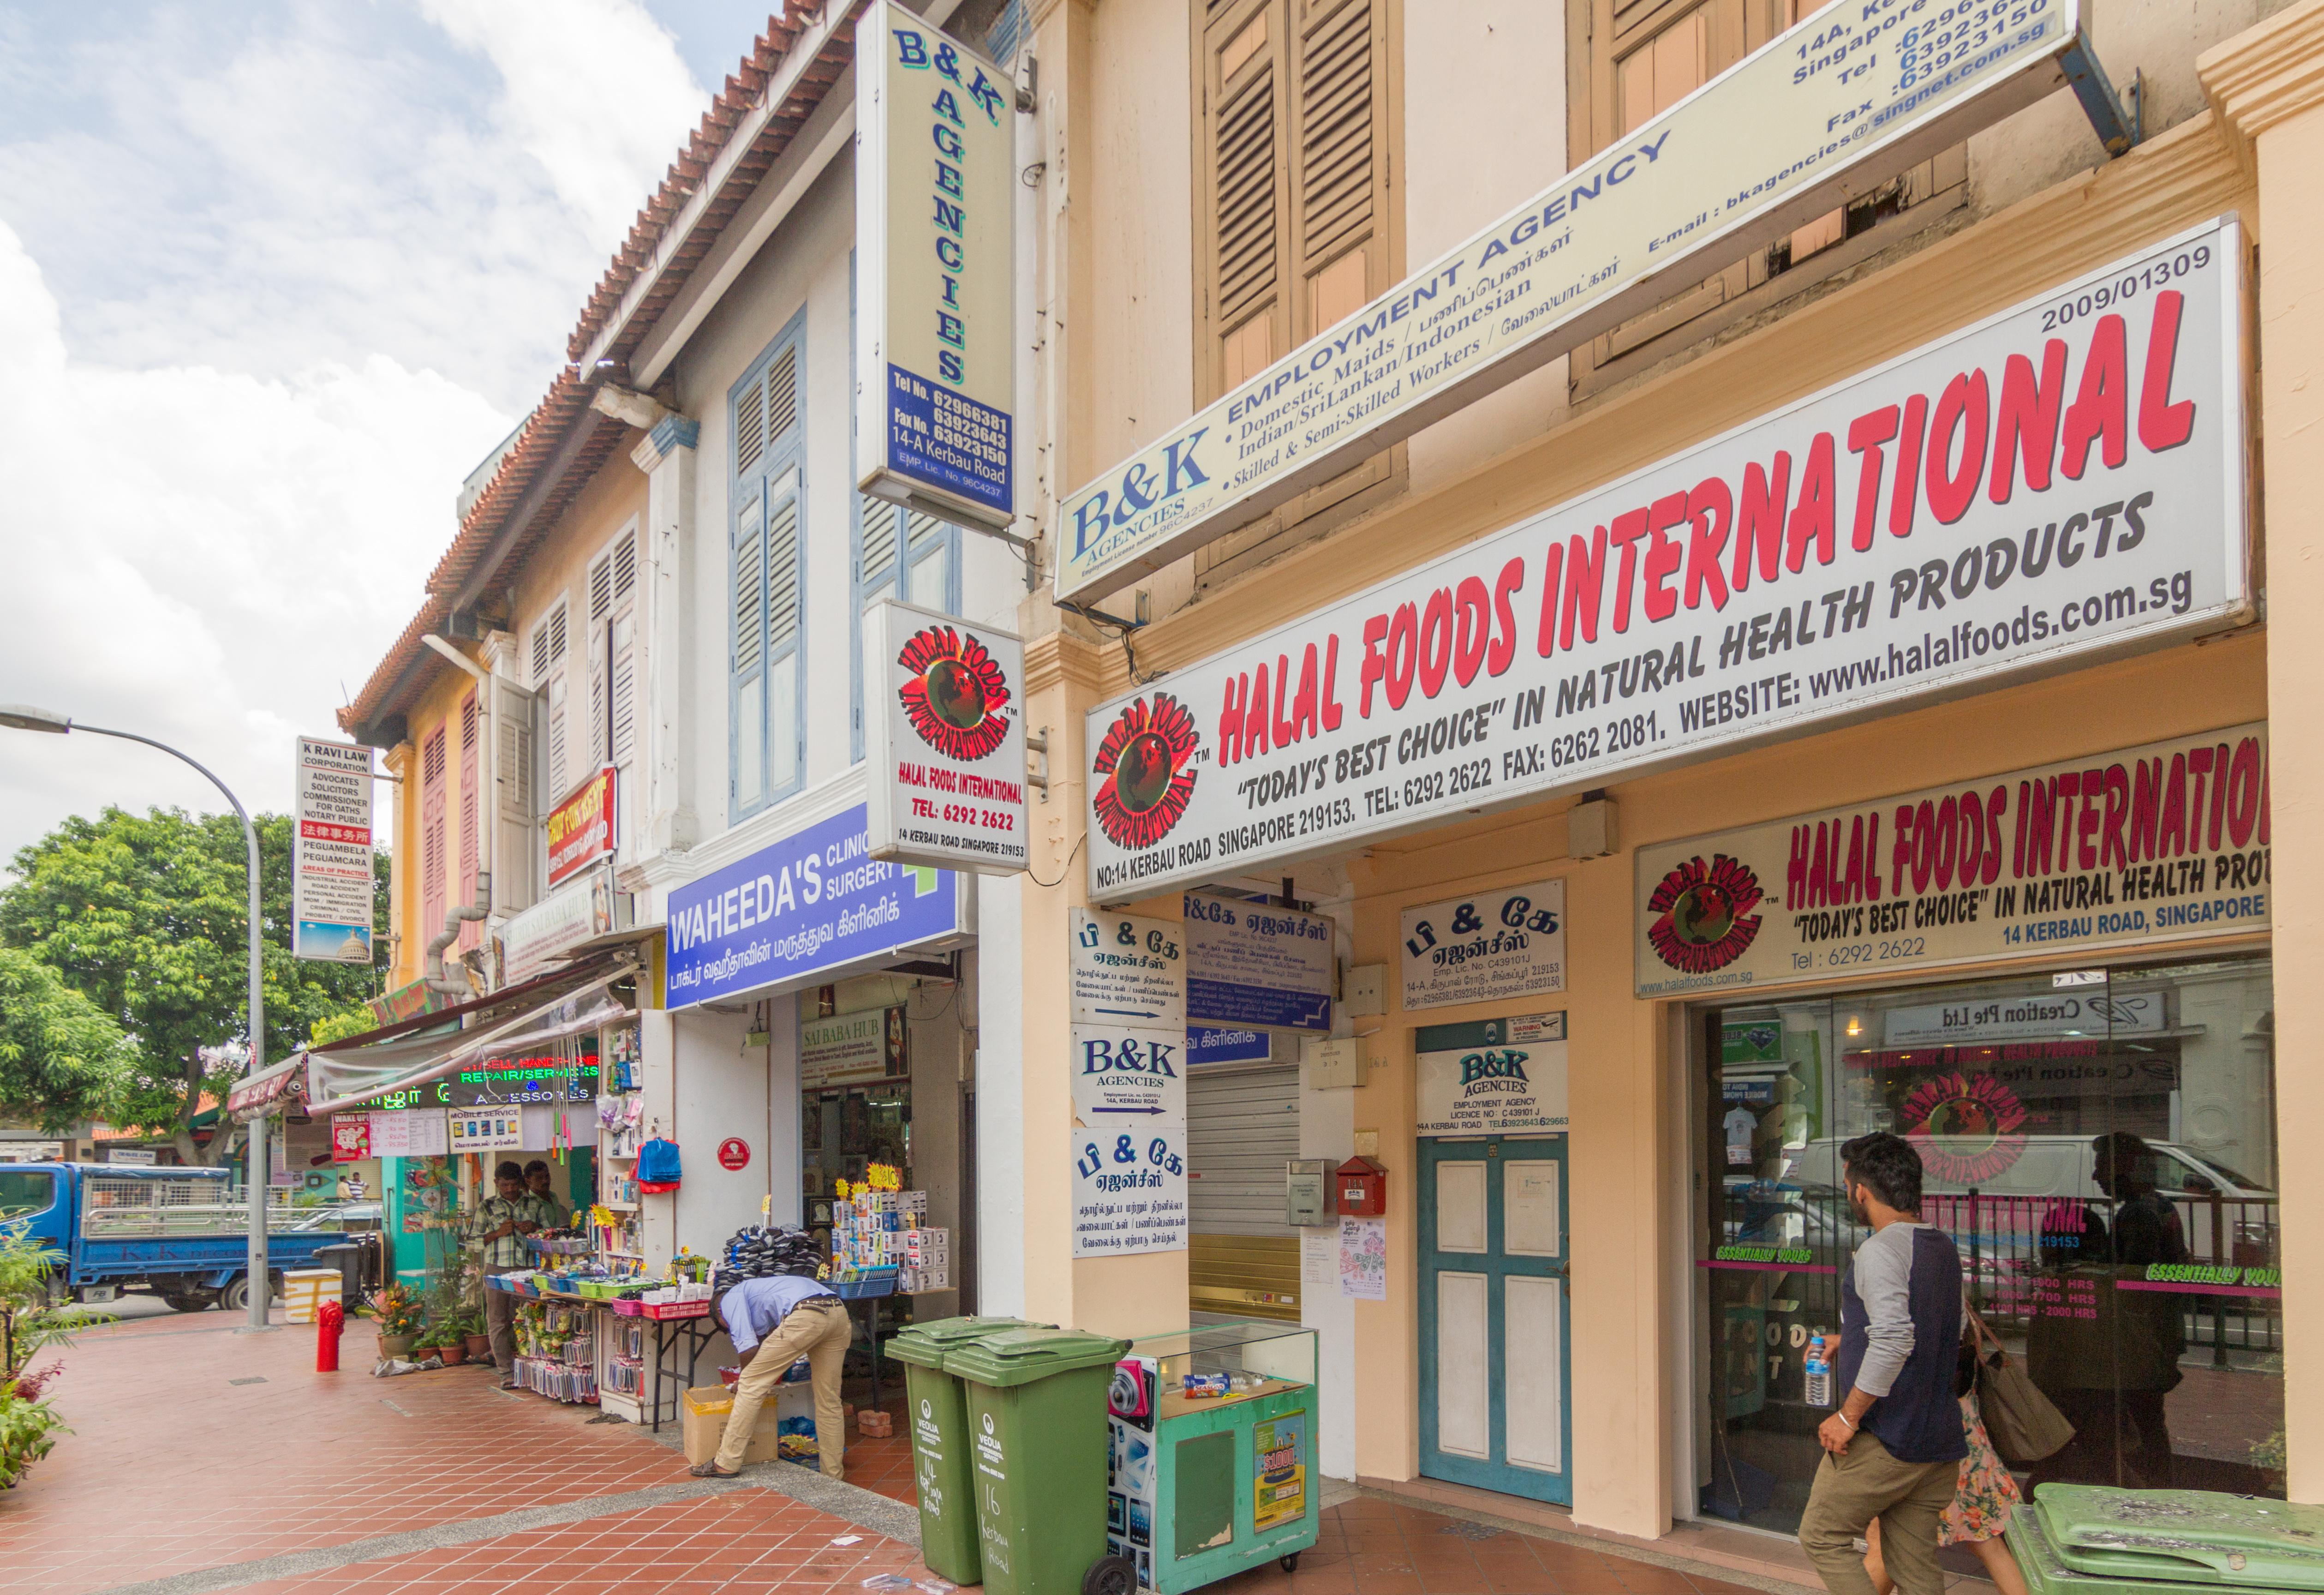 File:2016-04-03 Kerbau Road, Singapore 06 jpg - Wikimedia